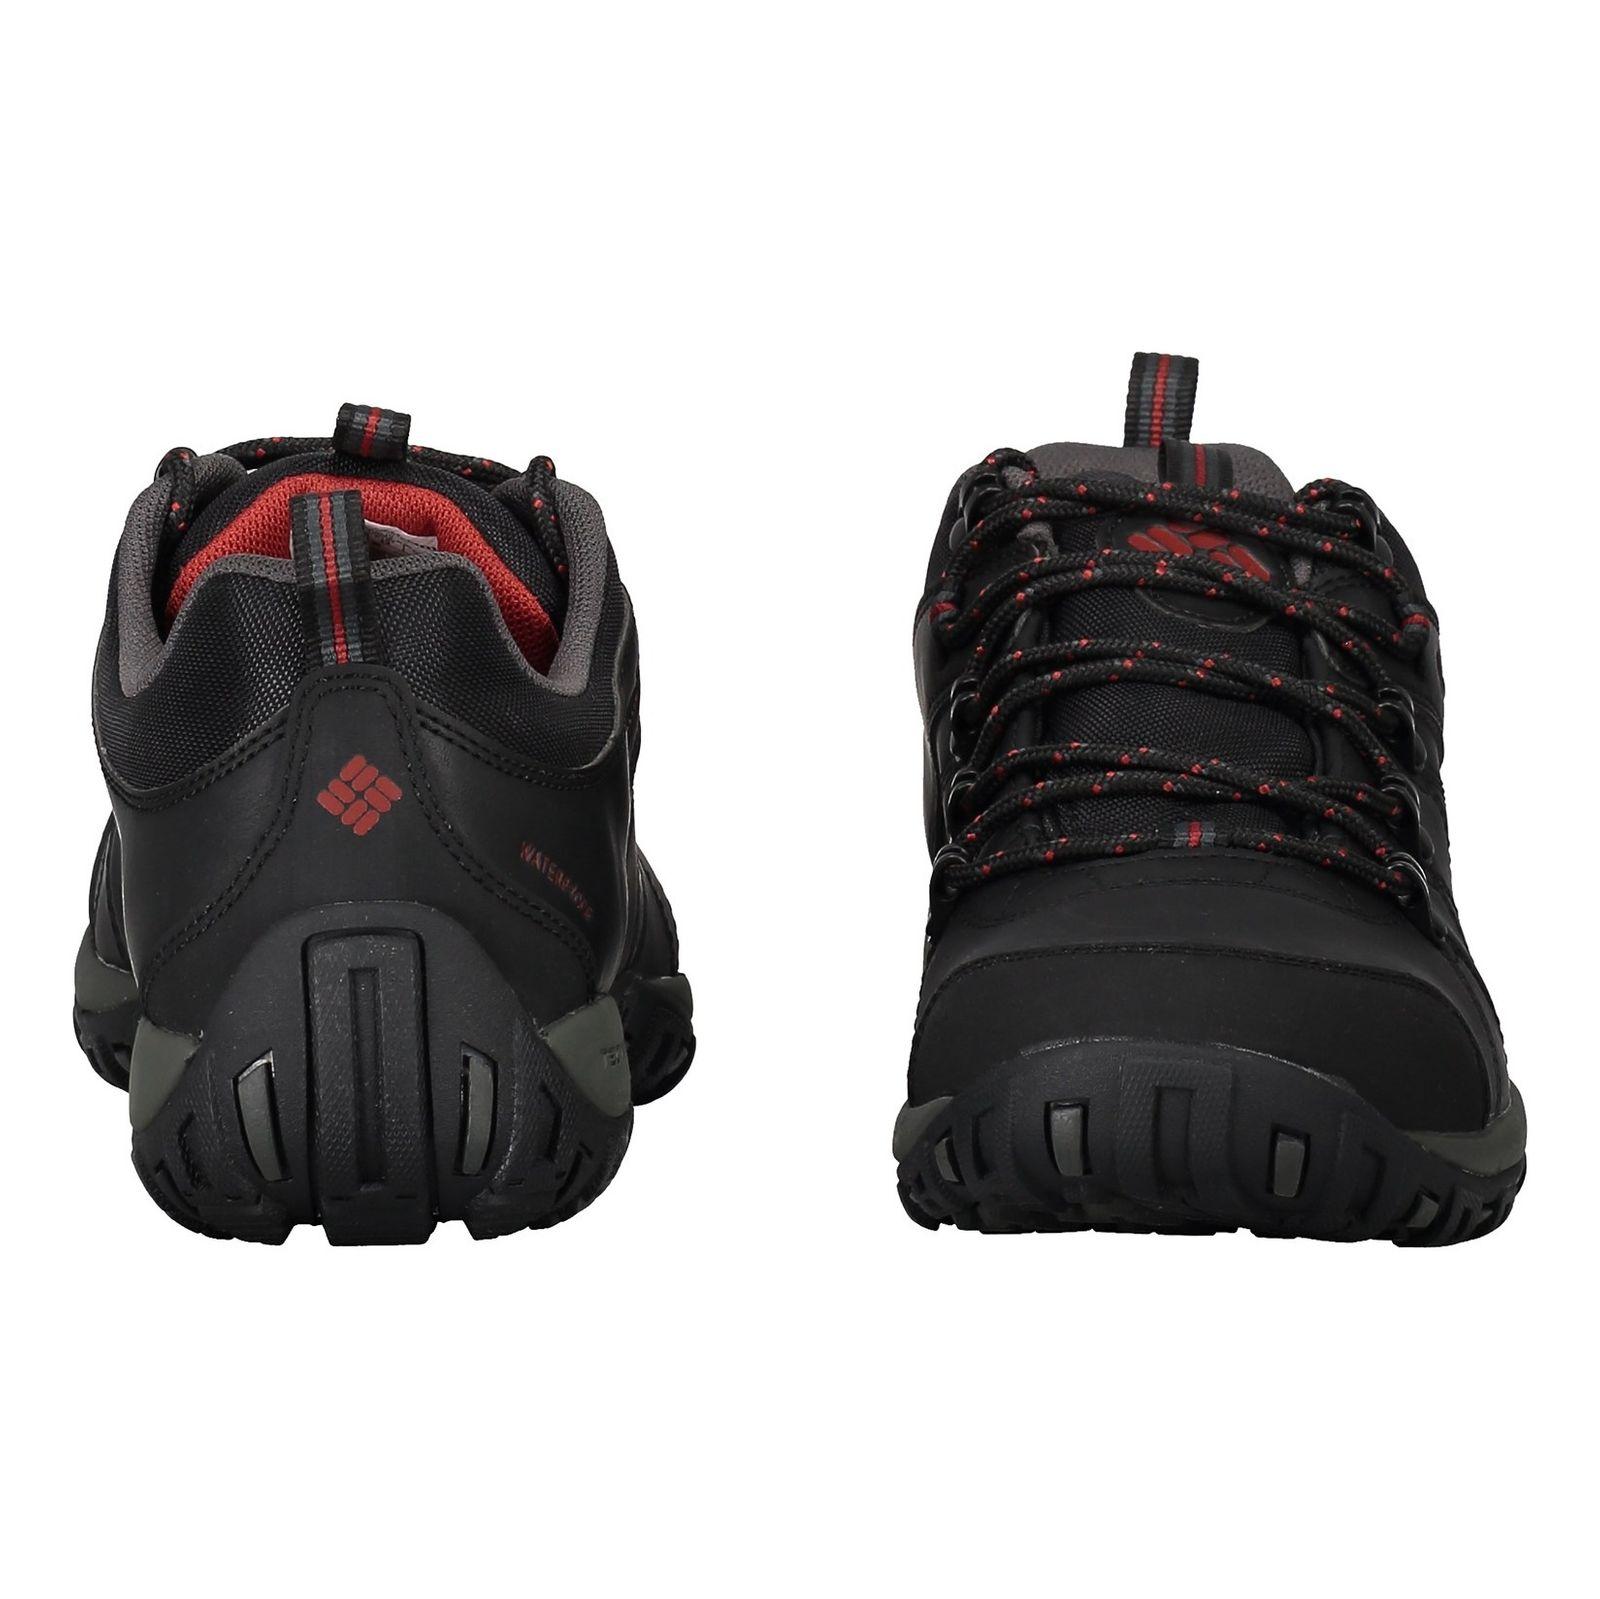 کفش طبیعت گردی بندی مردانه Peakfreak Venture - کلمبیا - مشکي - 5